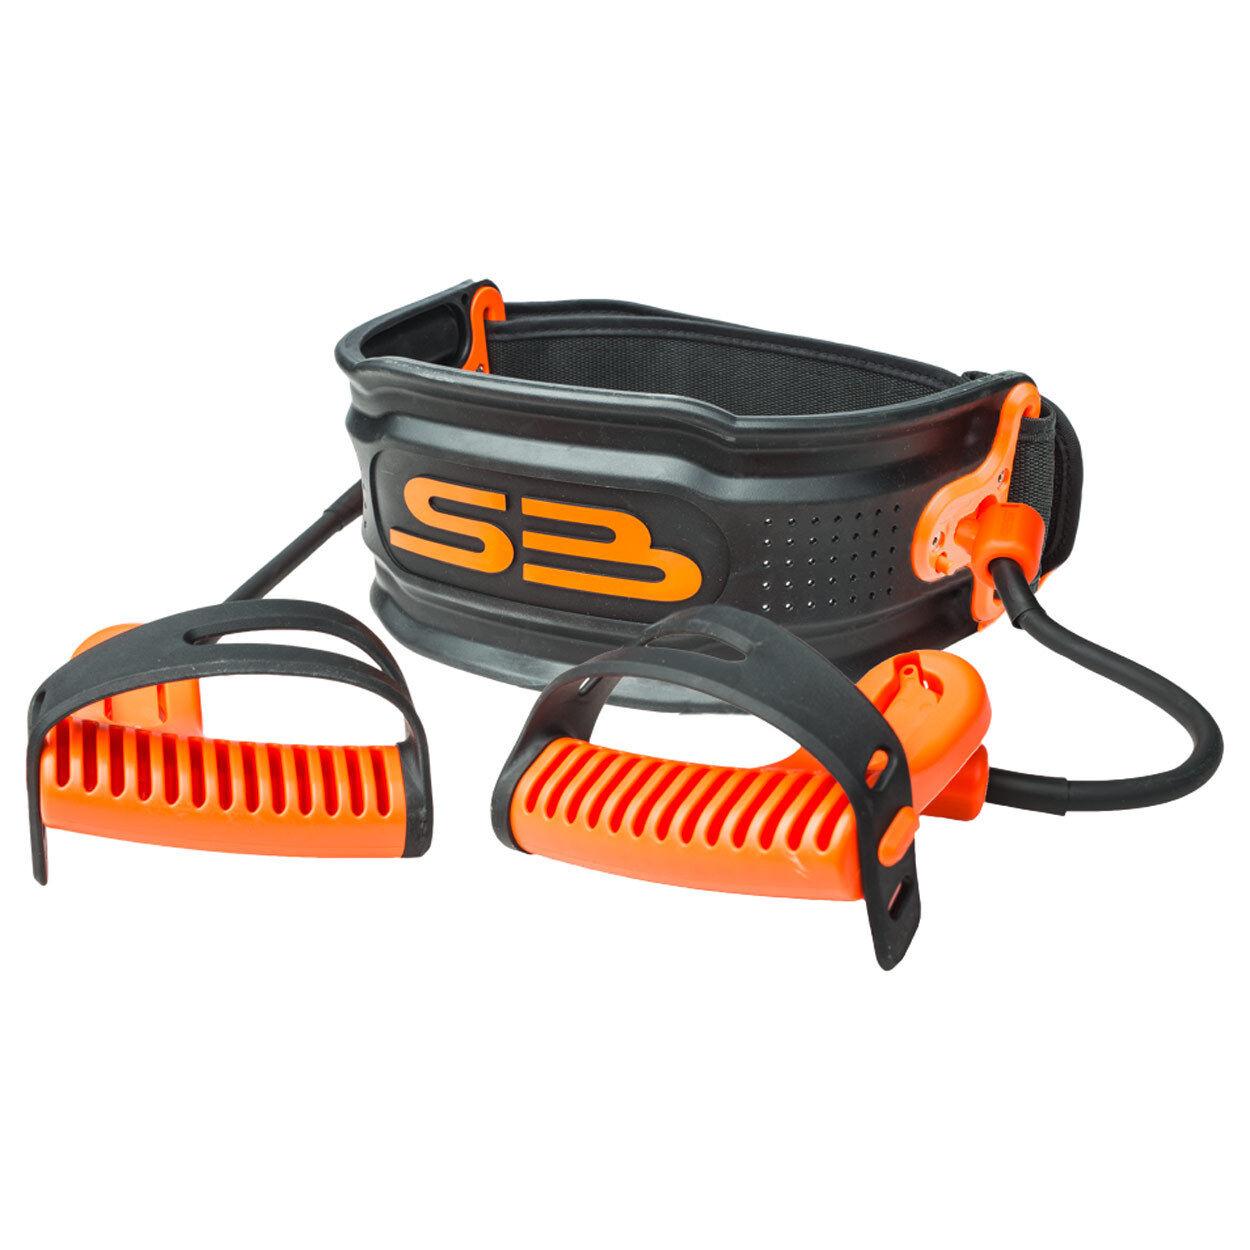 Shadowboxer Boxtrainer, Fitness- und Boxtrainer, Shadowboxer inkl. Power Tubes, leicht c3c7bd